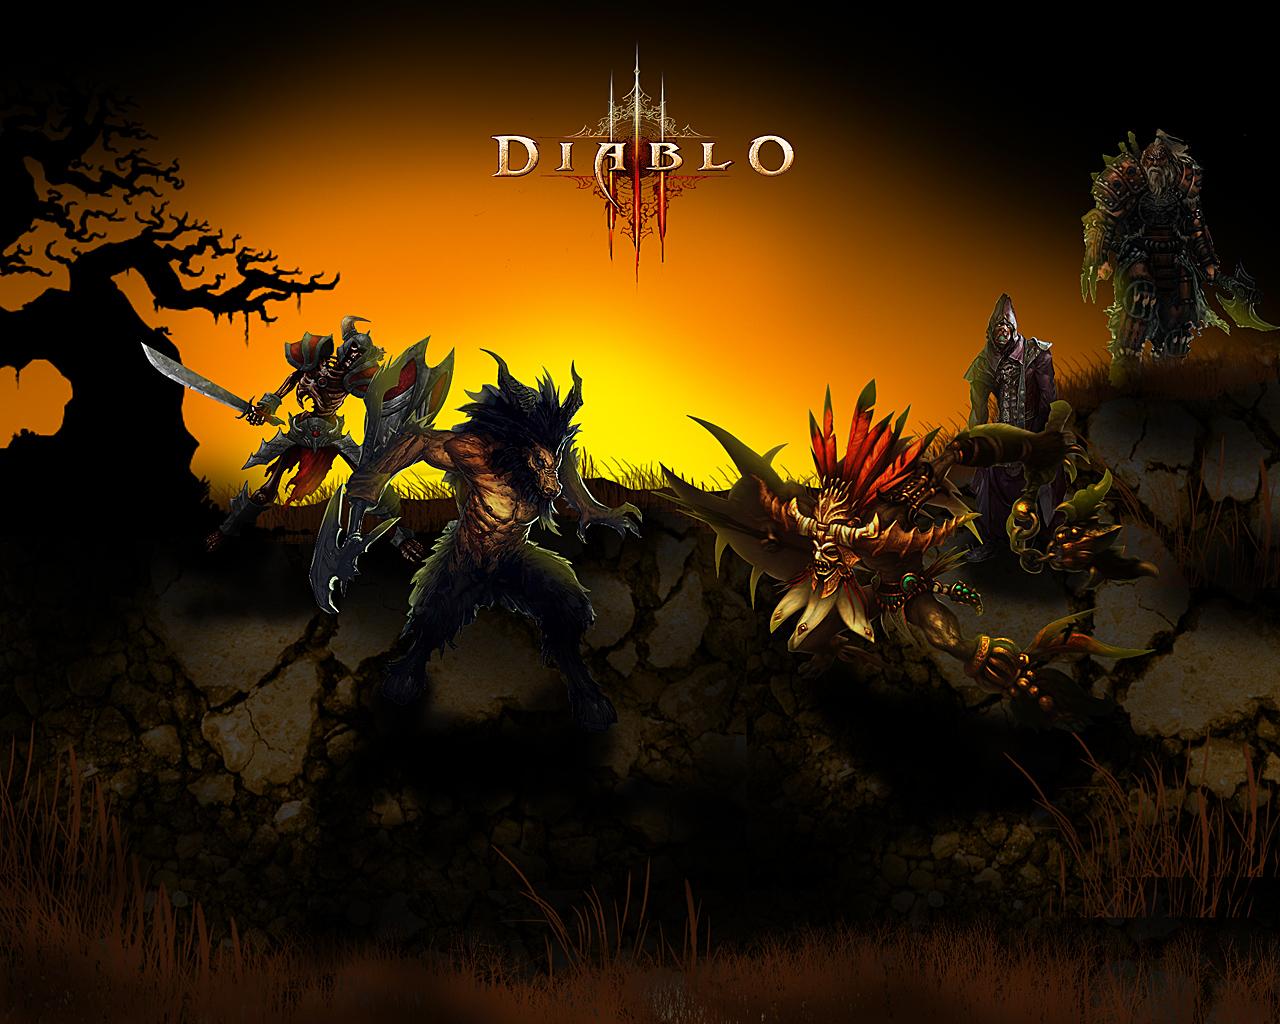 Diablo 3 wallpapers HD   Desktop backgrounds 1280x1024